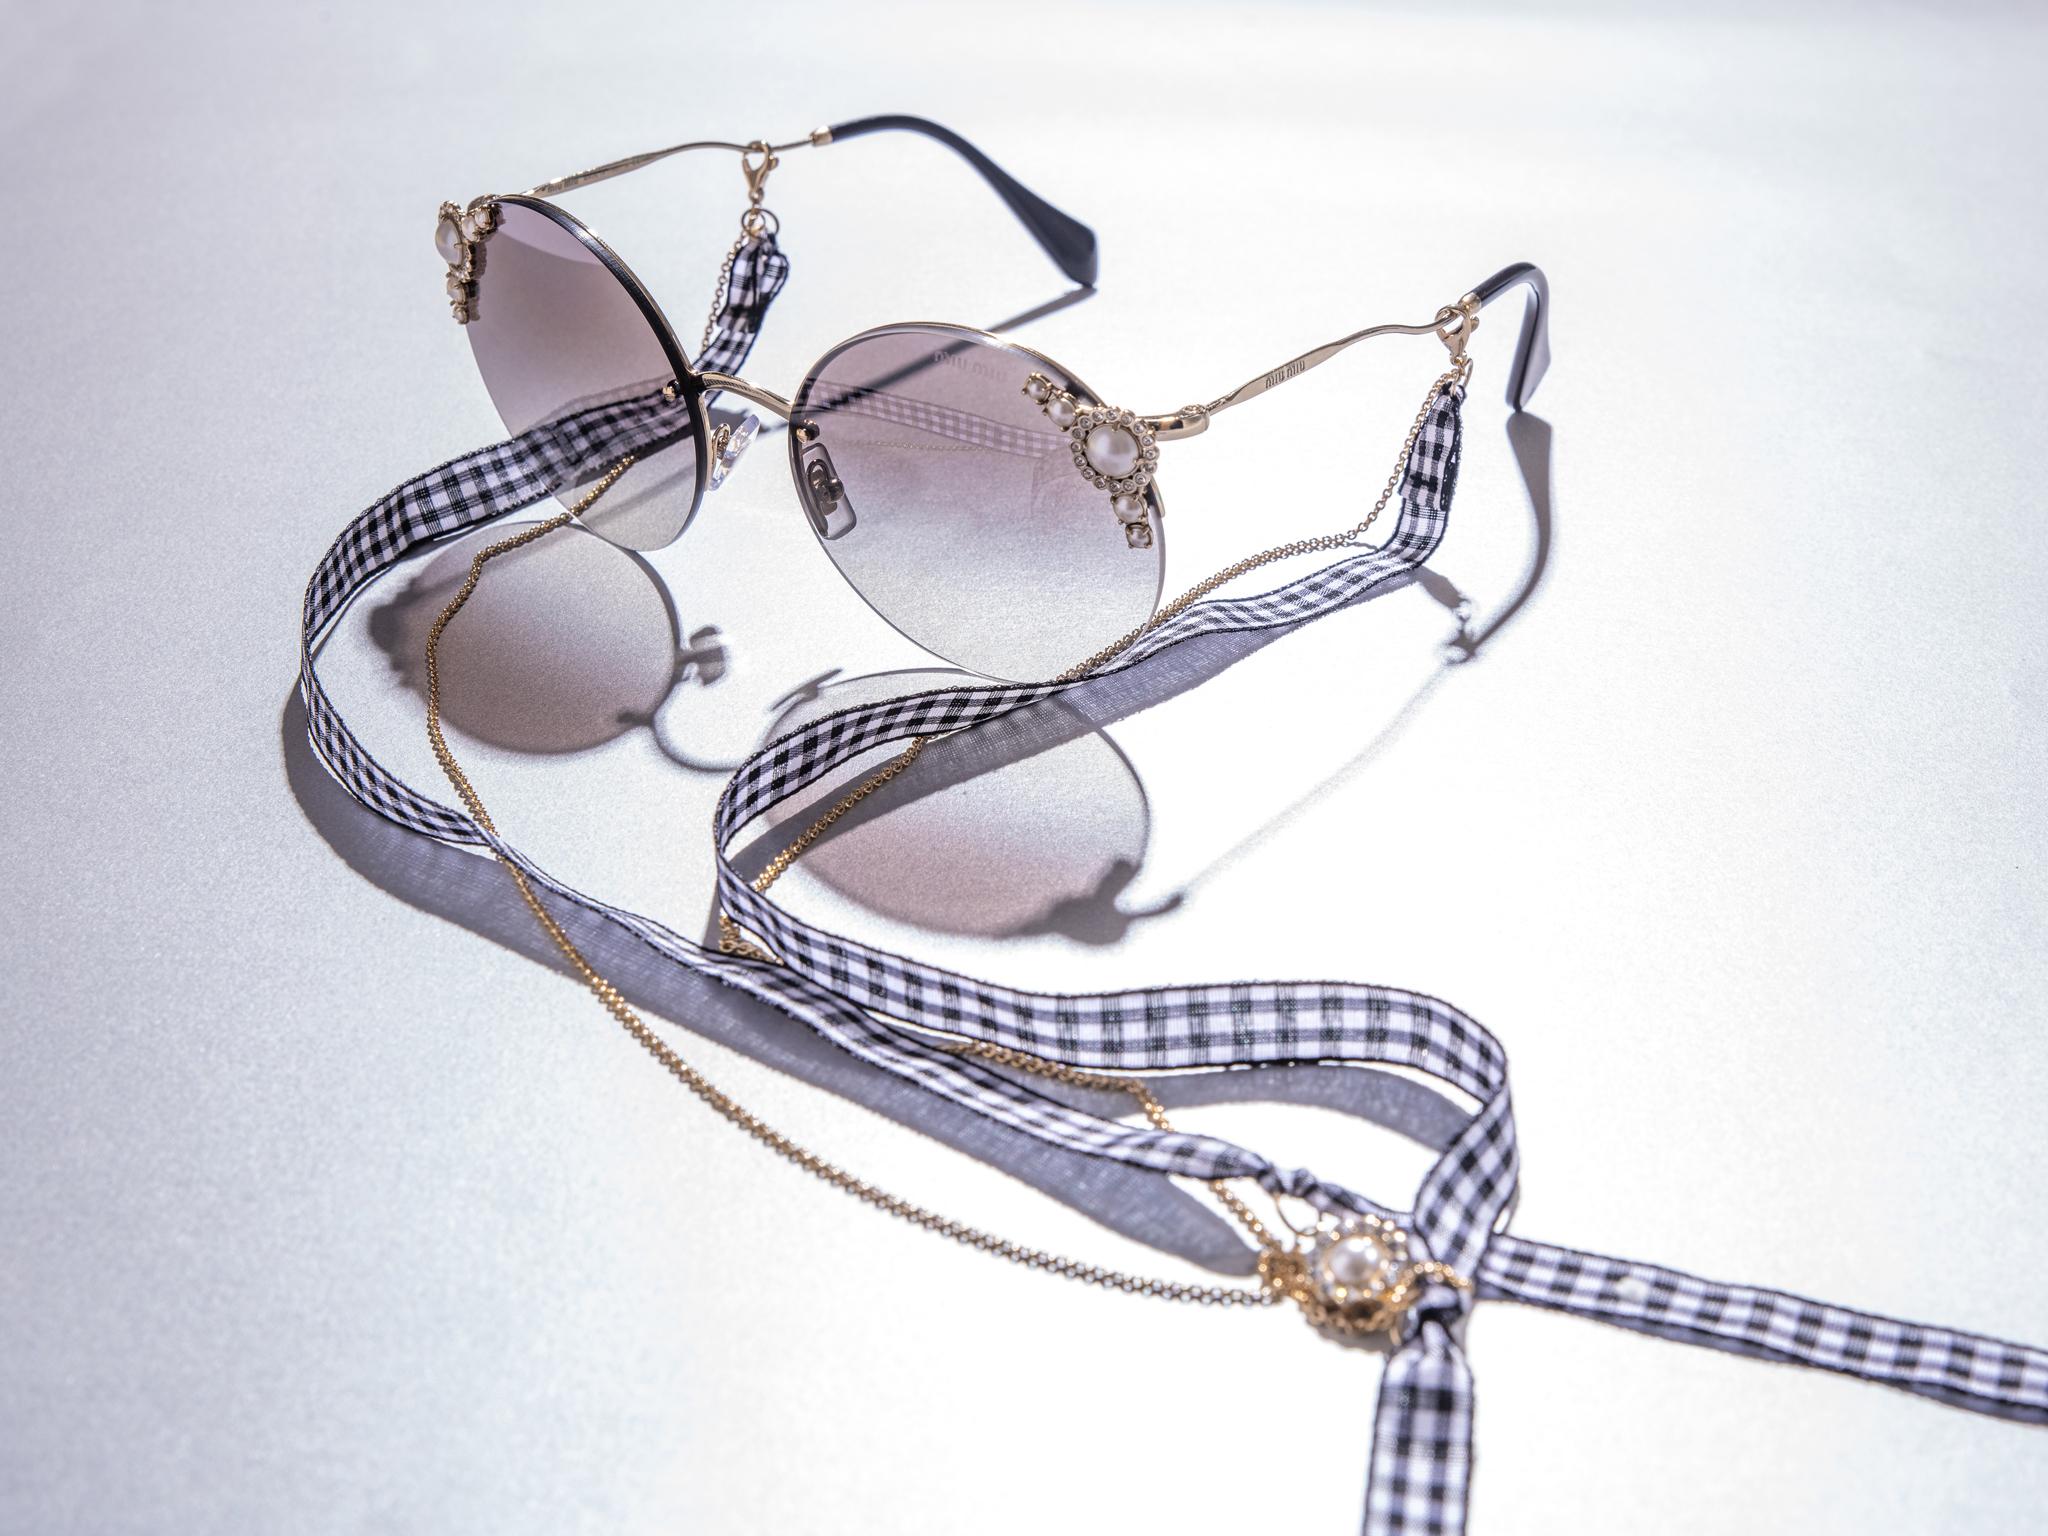 miu miu sunglasses ss18